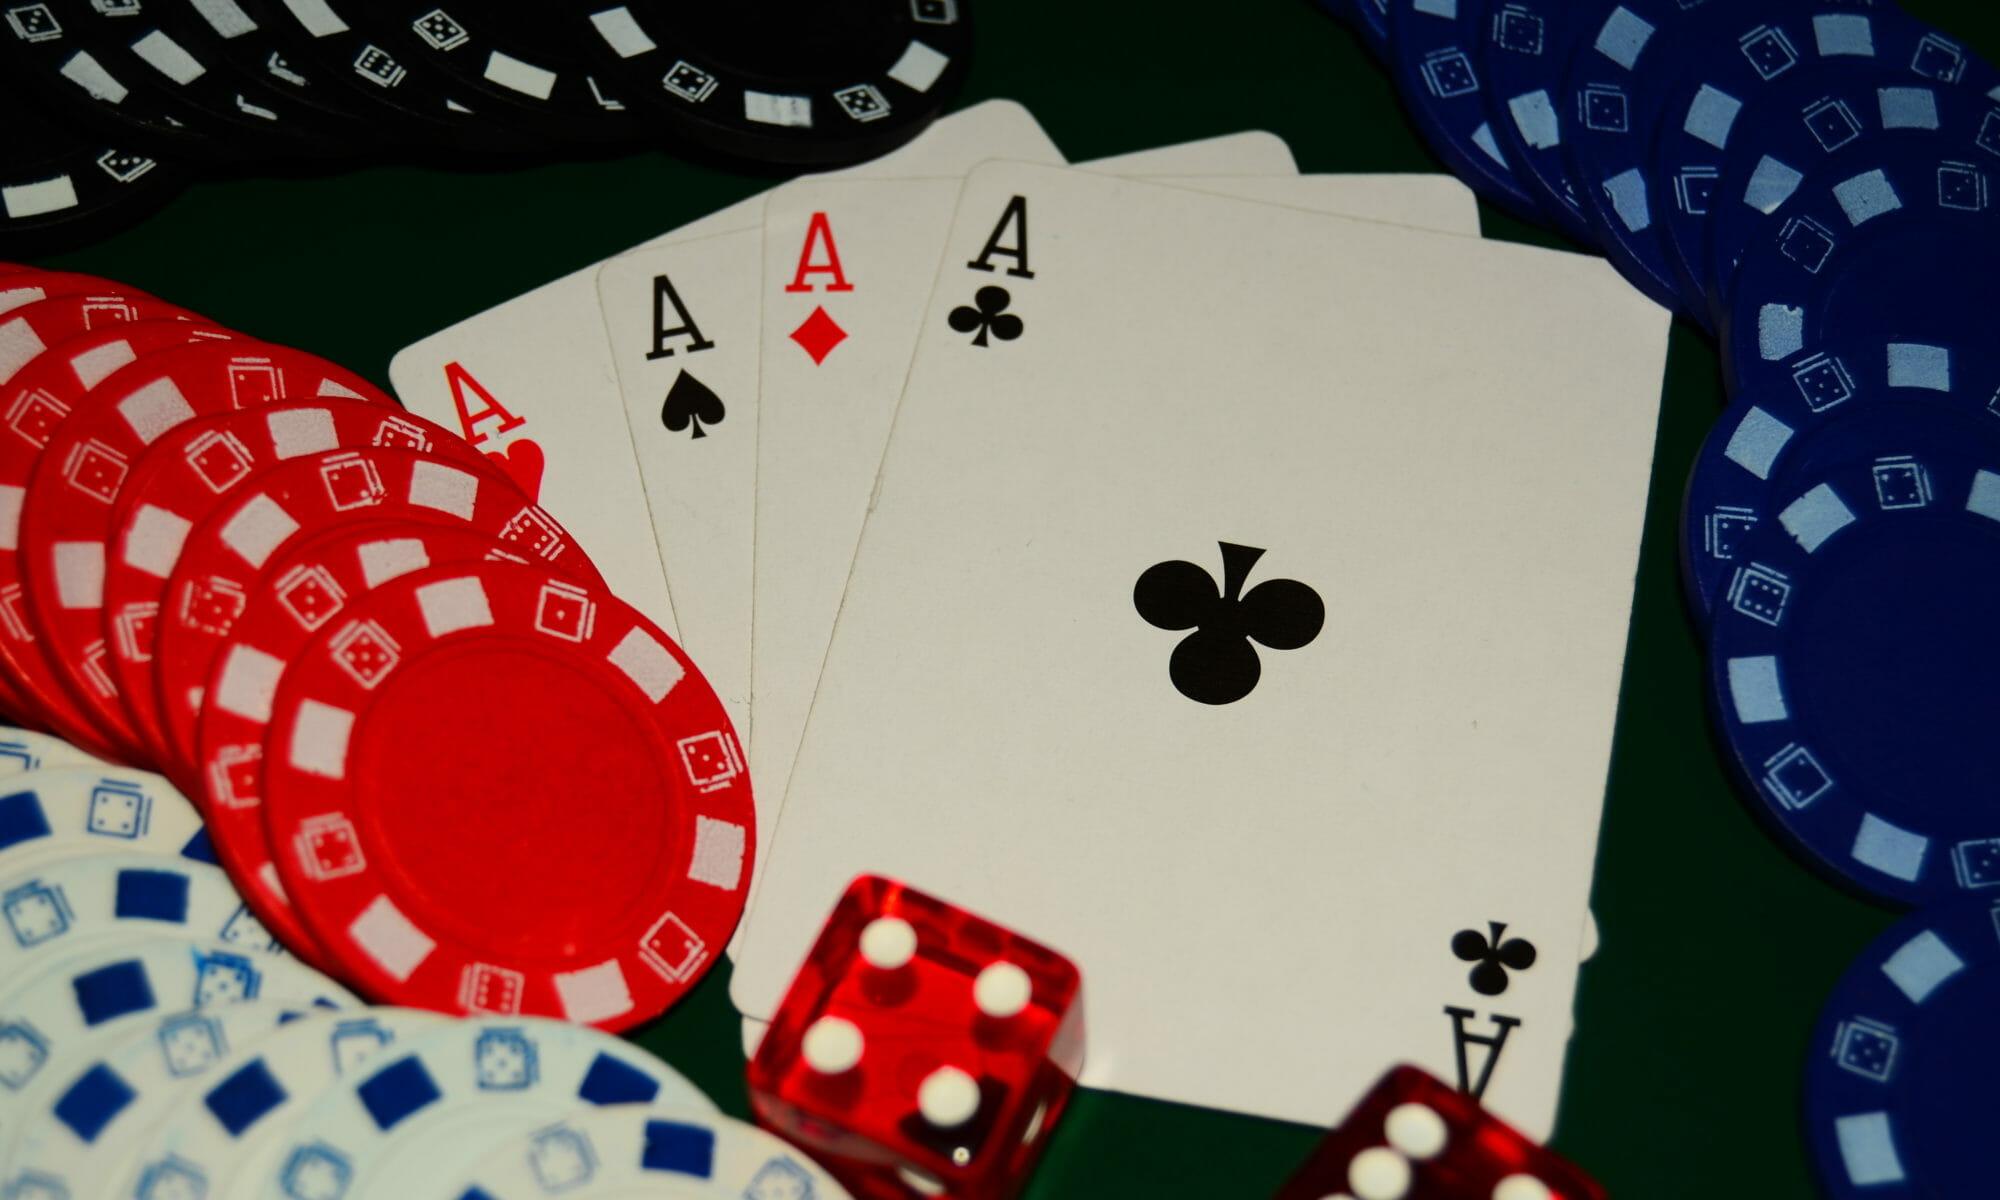 aces-poker-hand-2000x1200.jpg